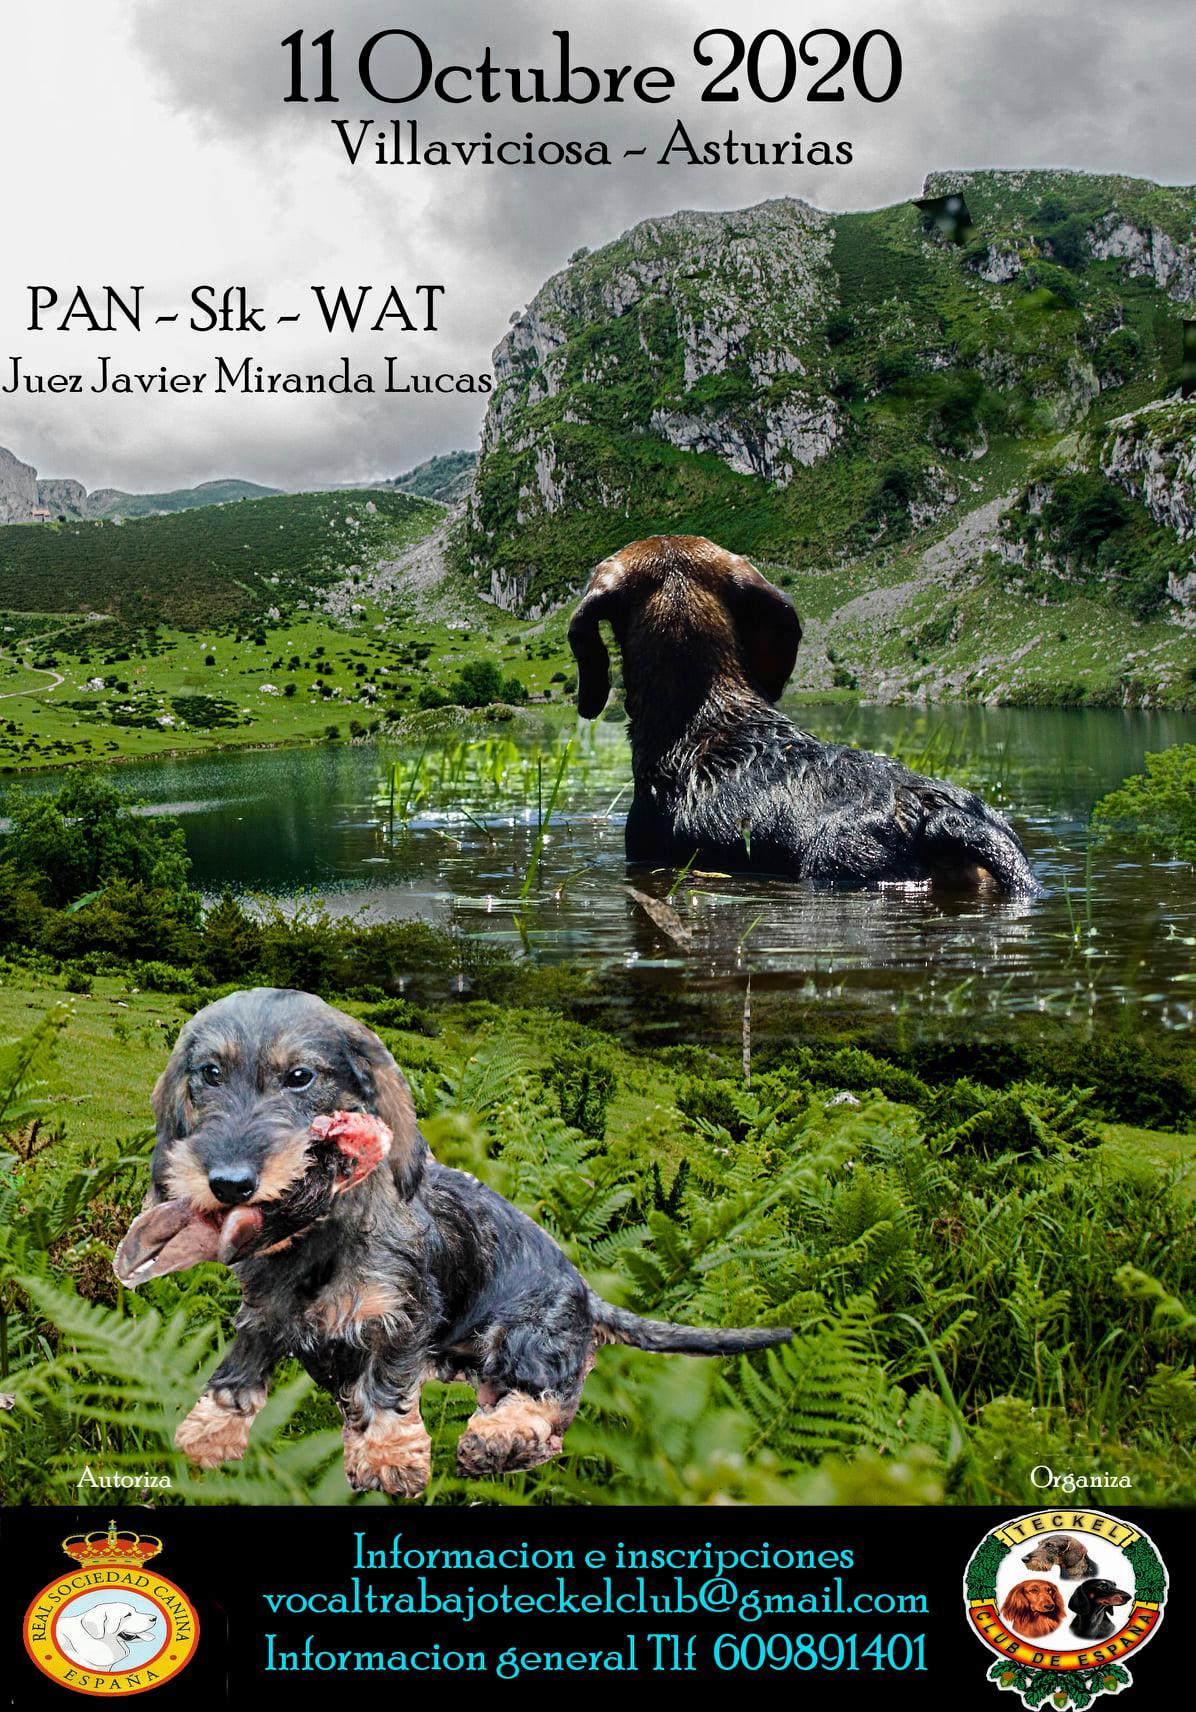 PAN ~sFK ~ WAT